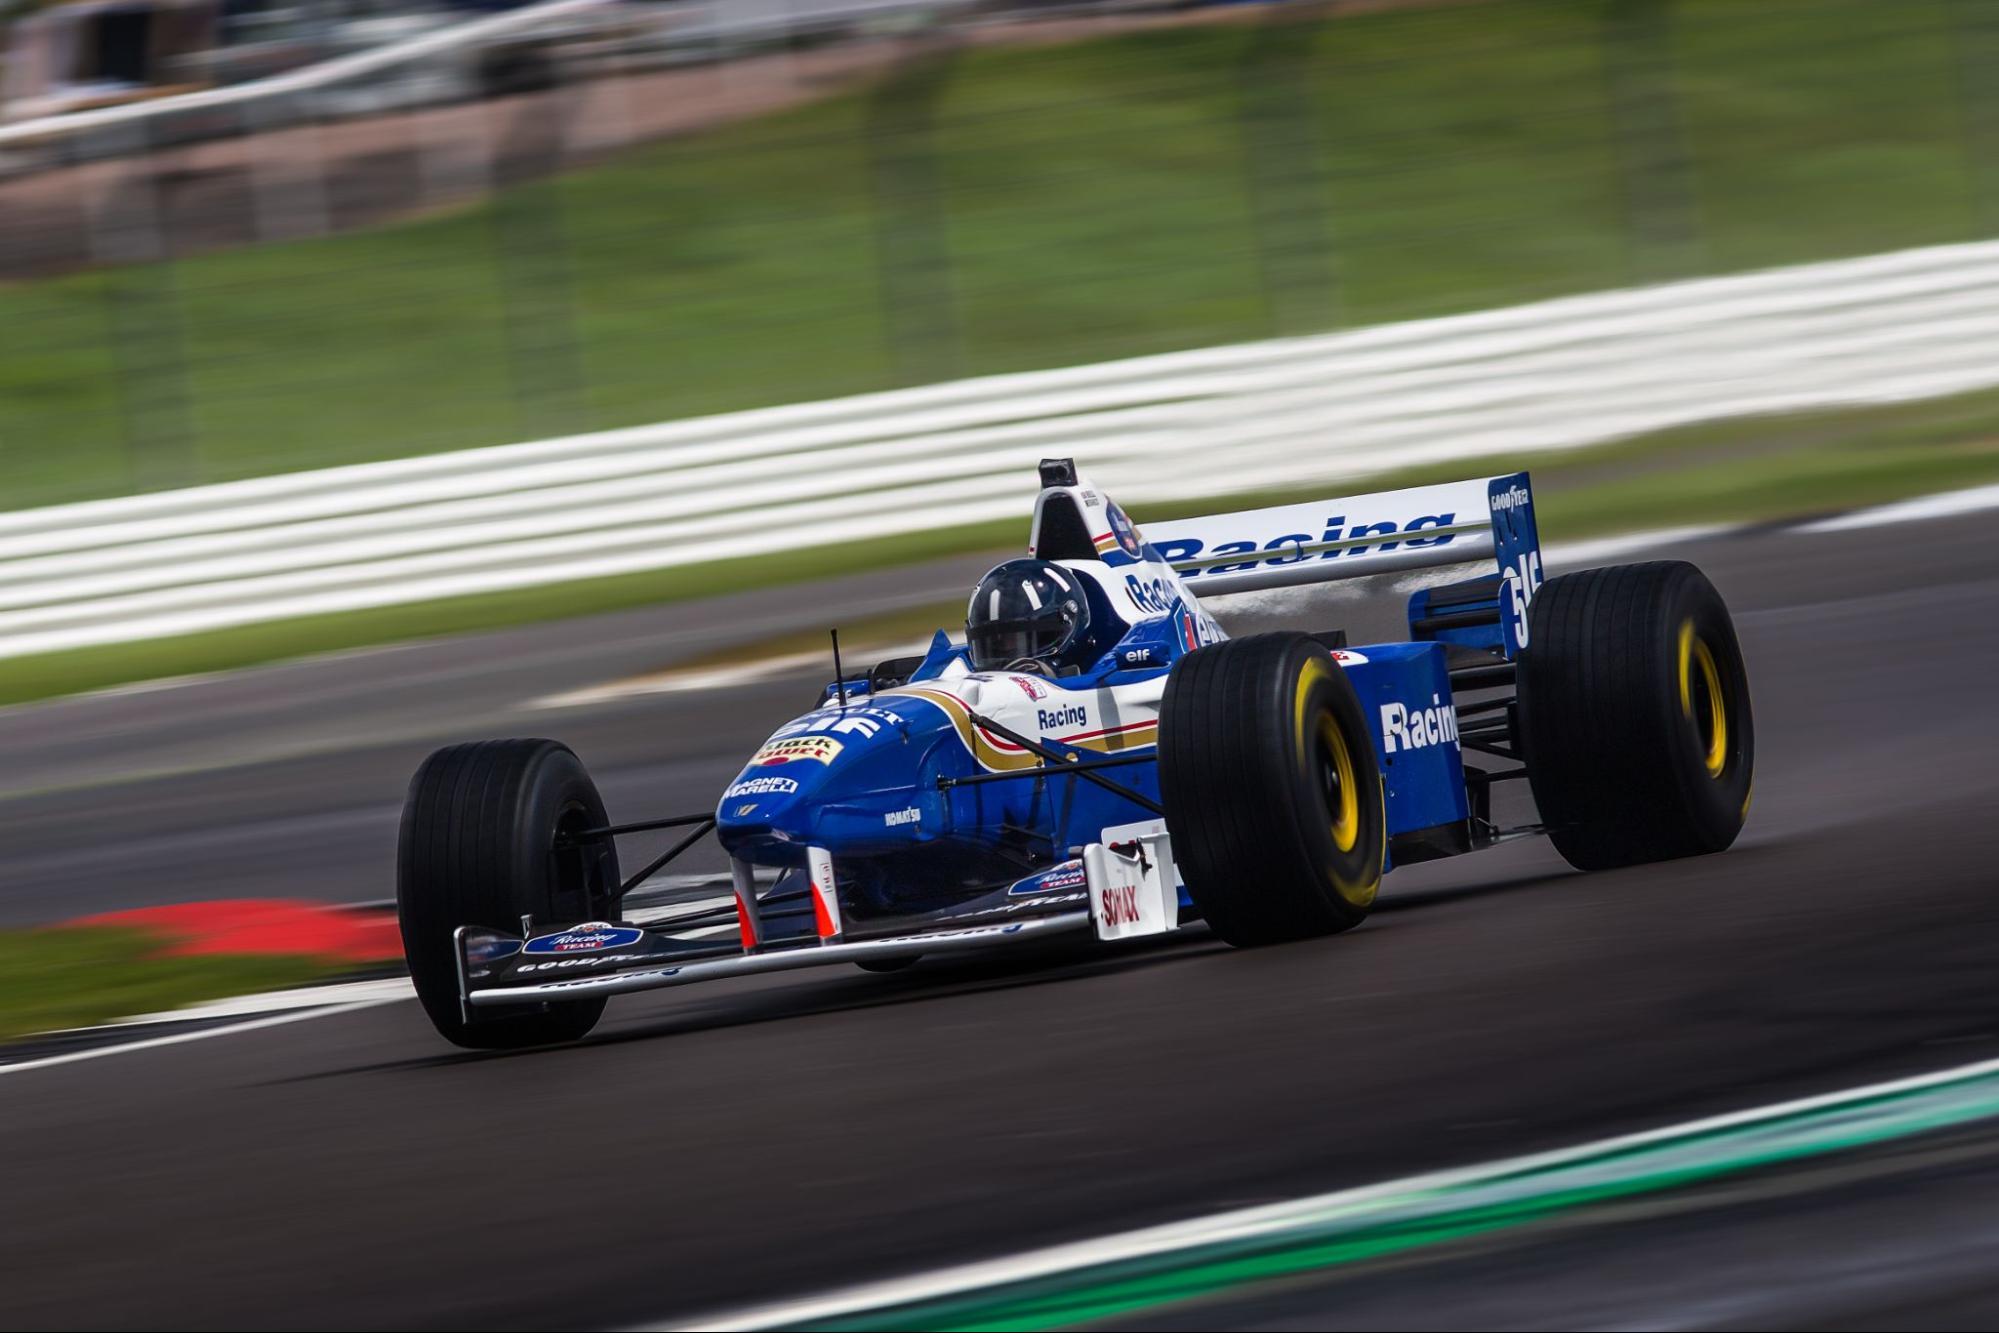 Damon Hill driving the Williams FW18